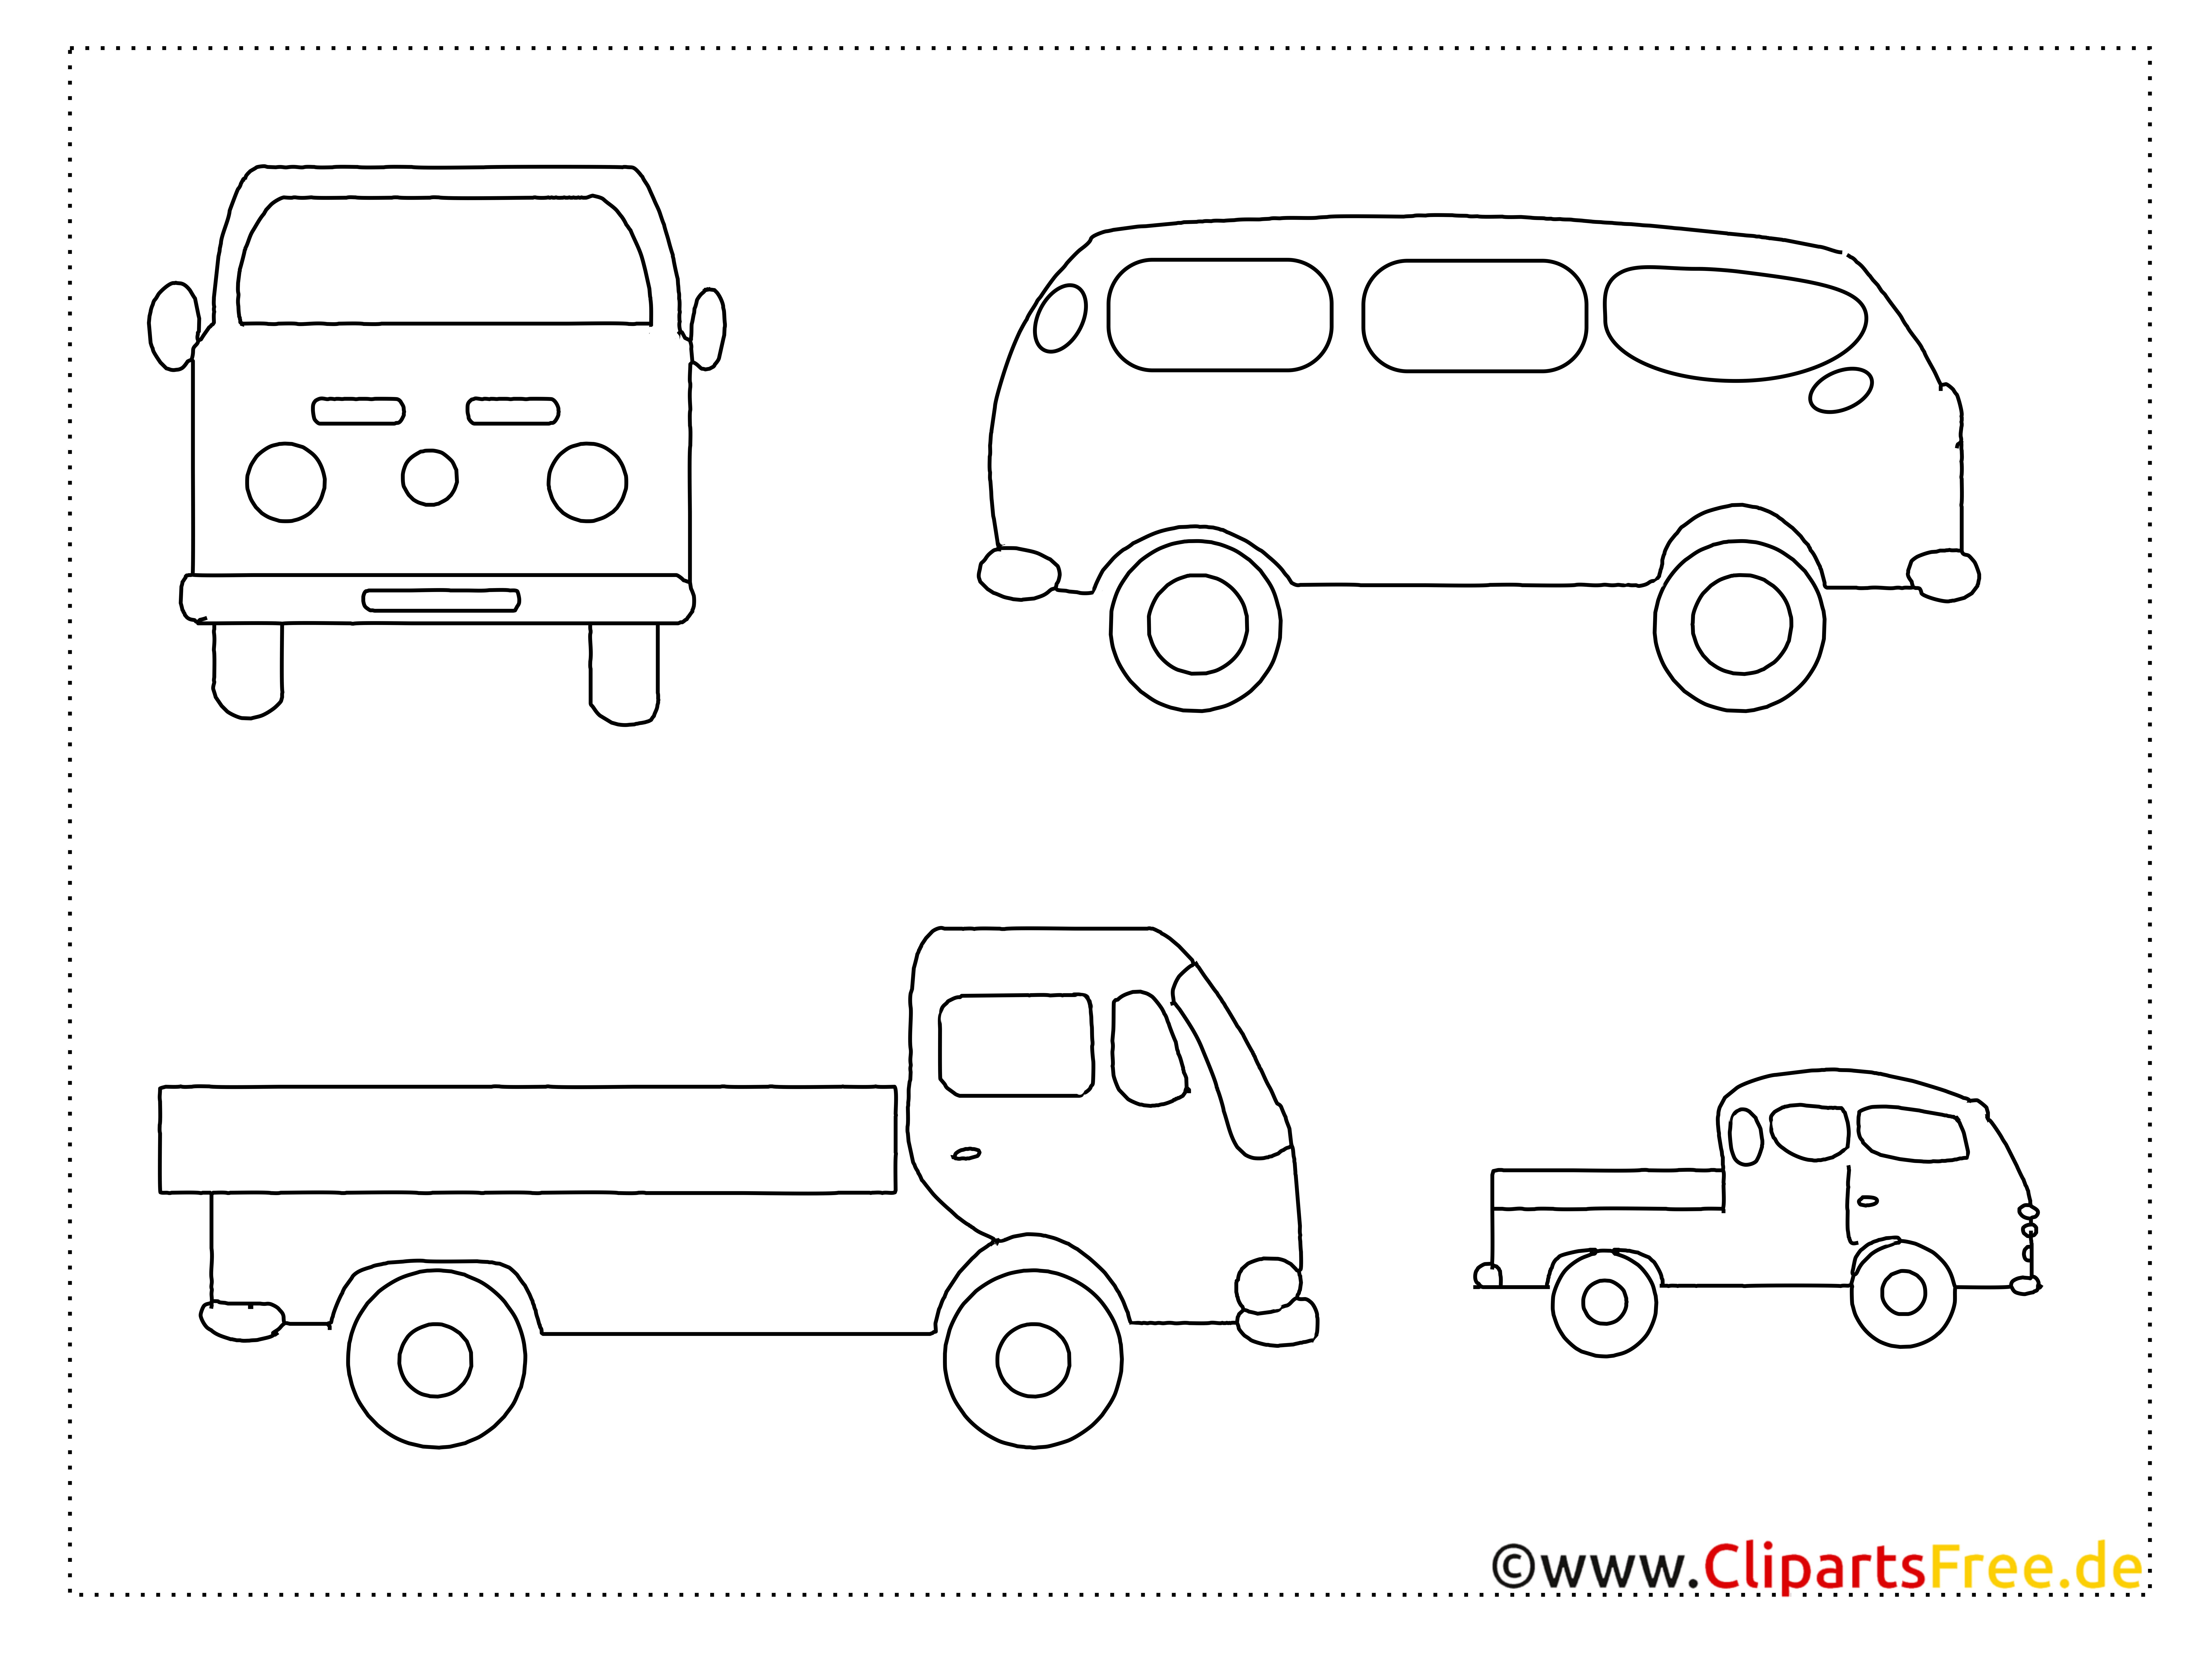 Bus, KIpper, LKW Malvorlage